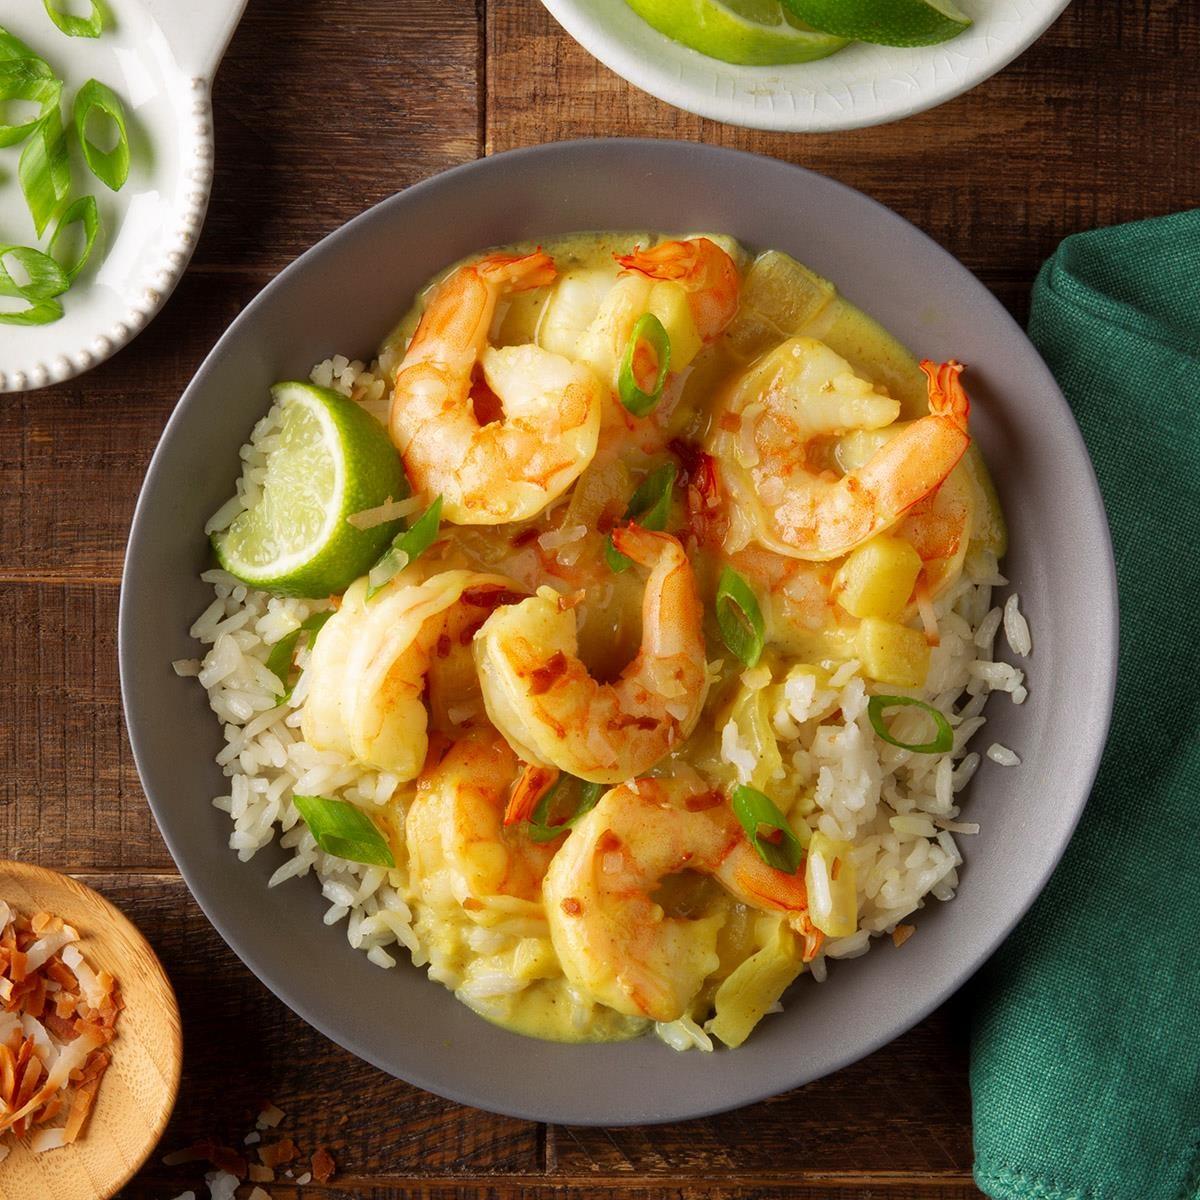 Day 25: Quick Shrimp Curry